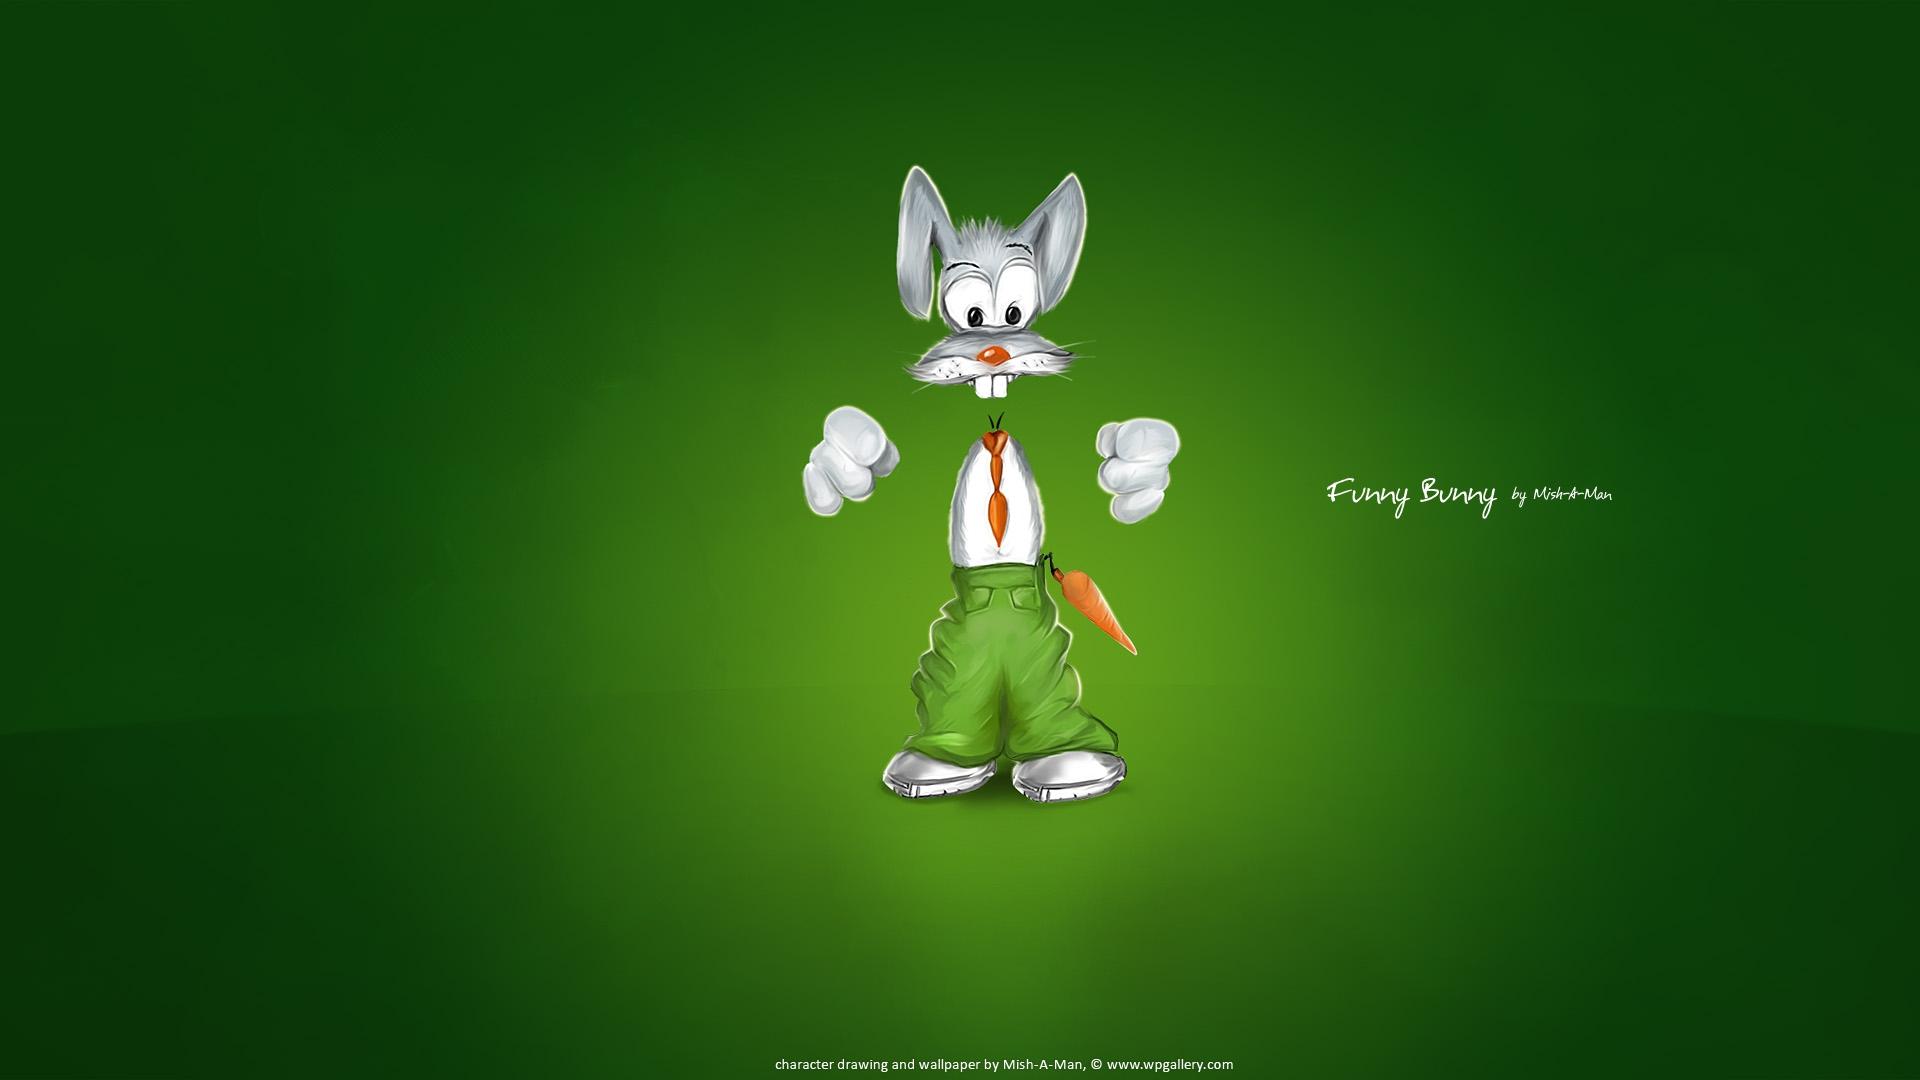 Funny Wallpaper Bunny 199299 1920x1080